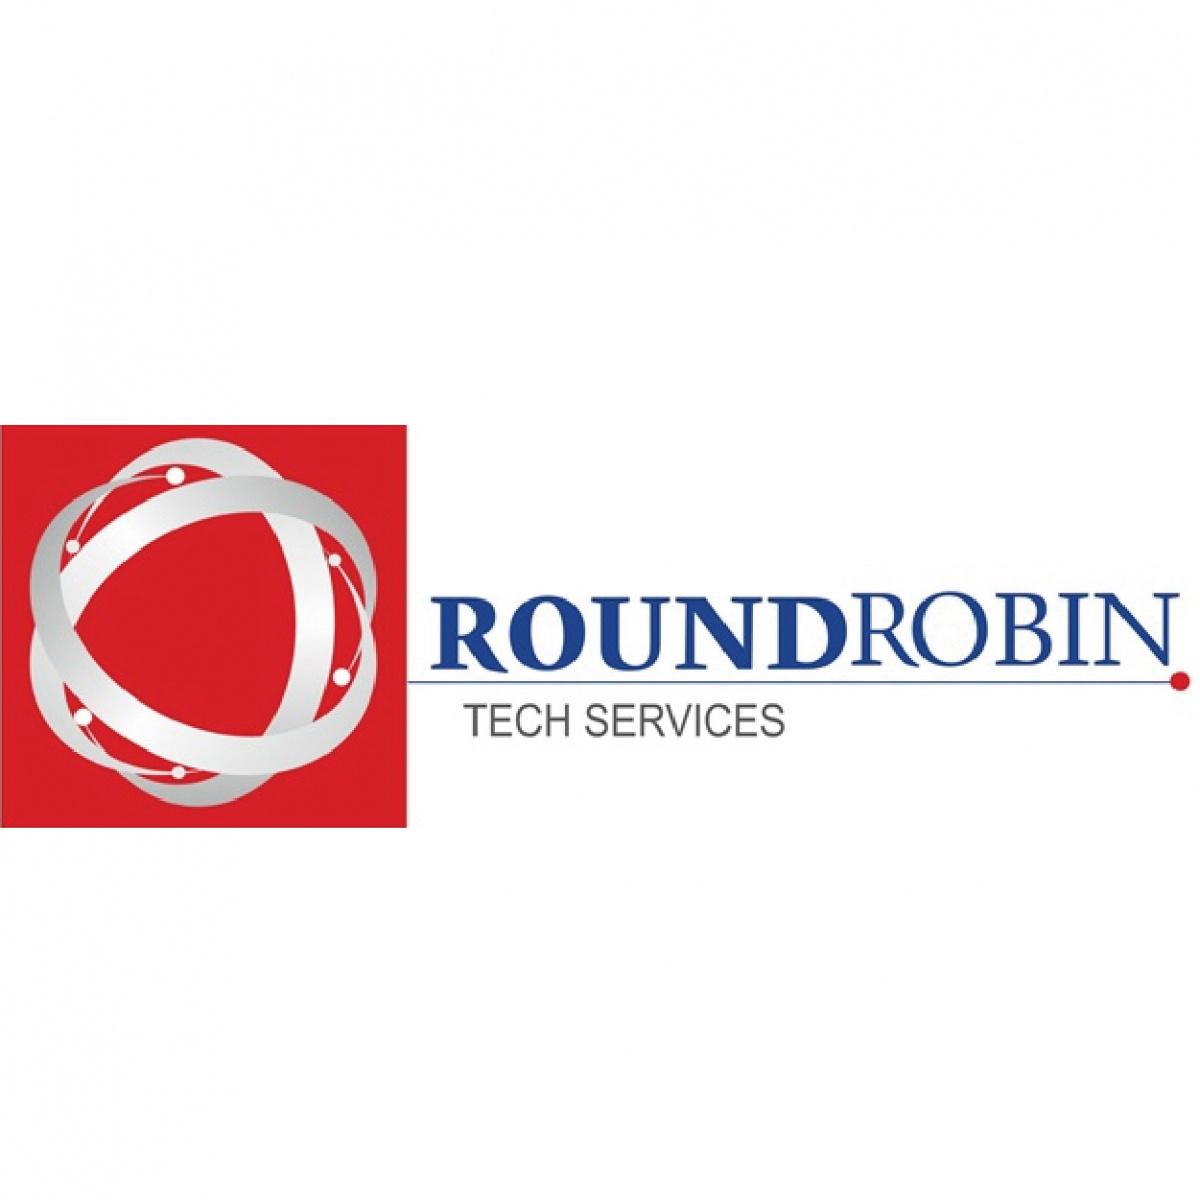 SecureAge Partner Roundrobin Tech Services